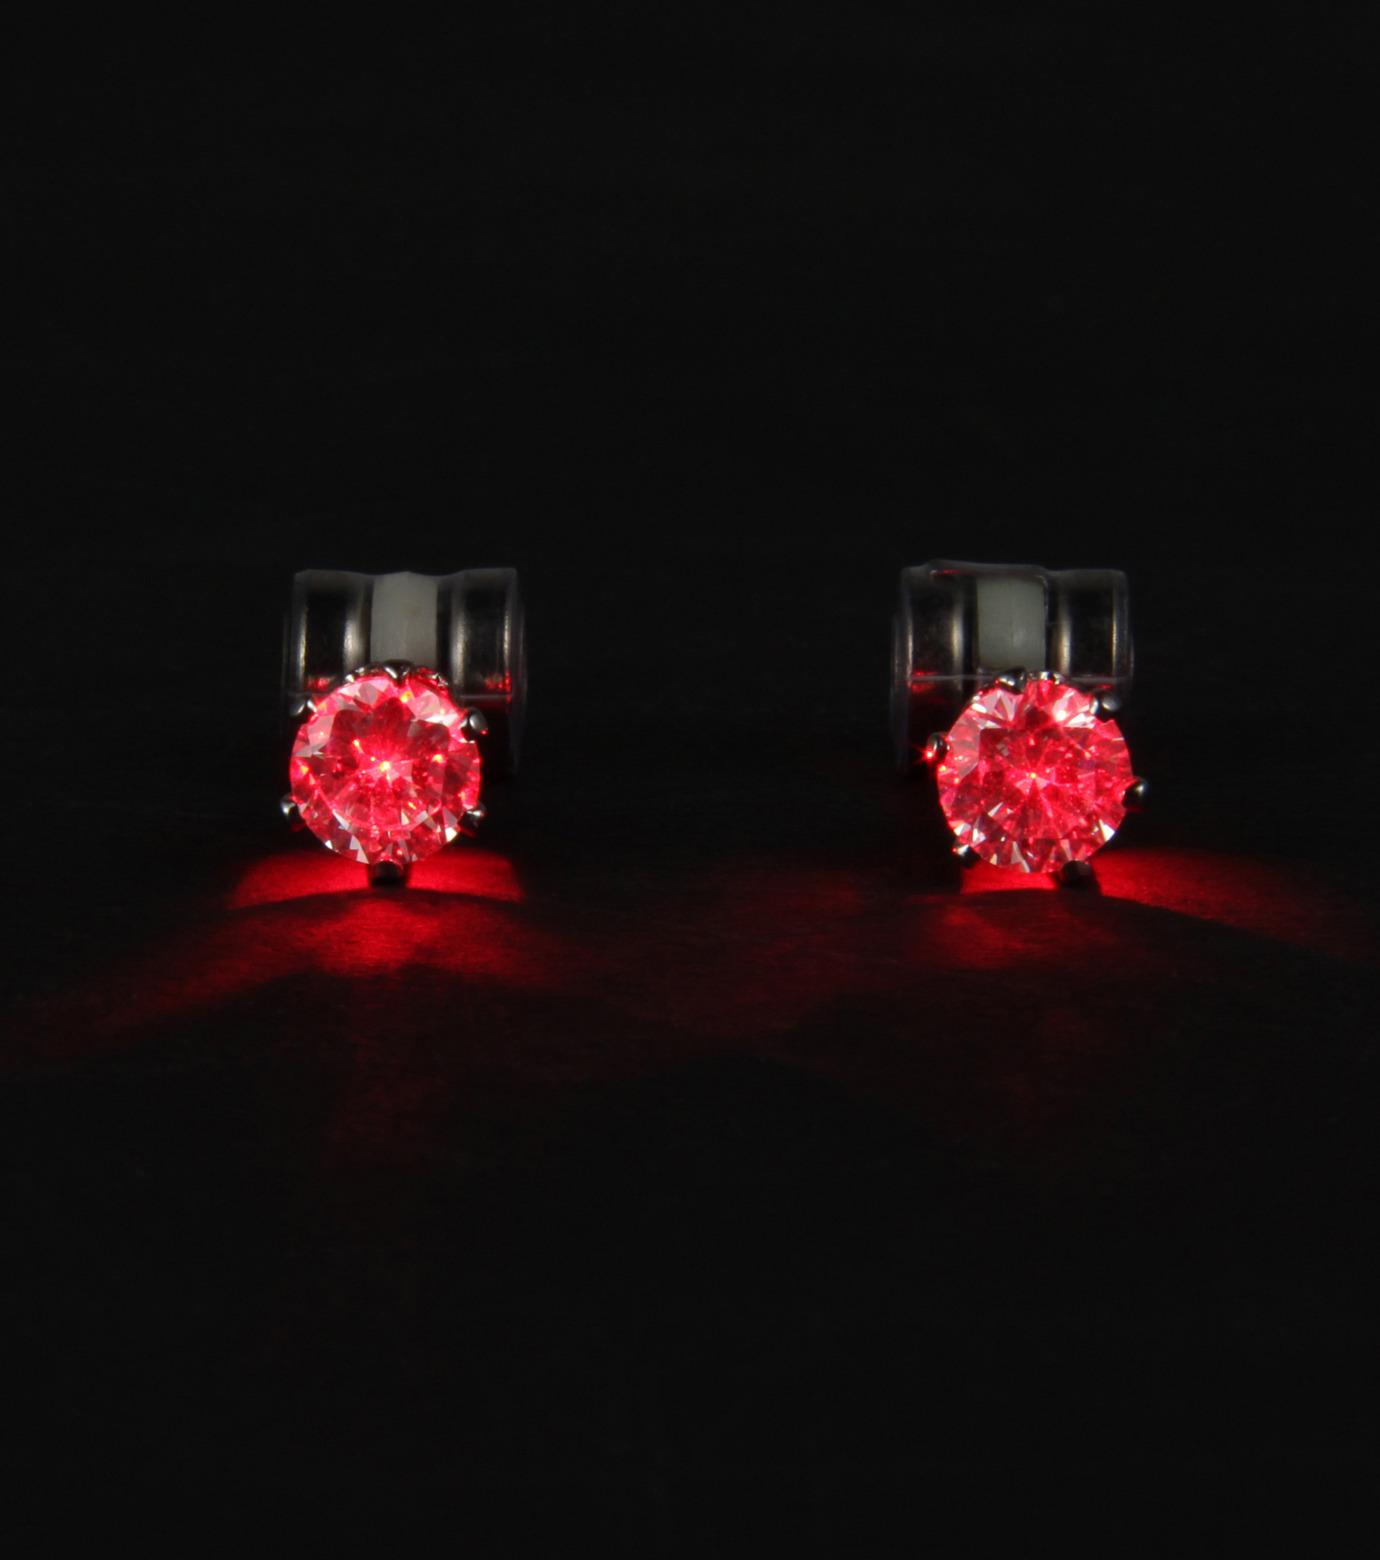 Night Ice(ナイトアイス)のOriginal Red-RED(ガジェット/ライト/gadgets/light)-Original-62 拡大詳細画像3